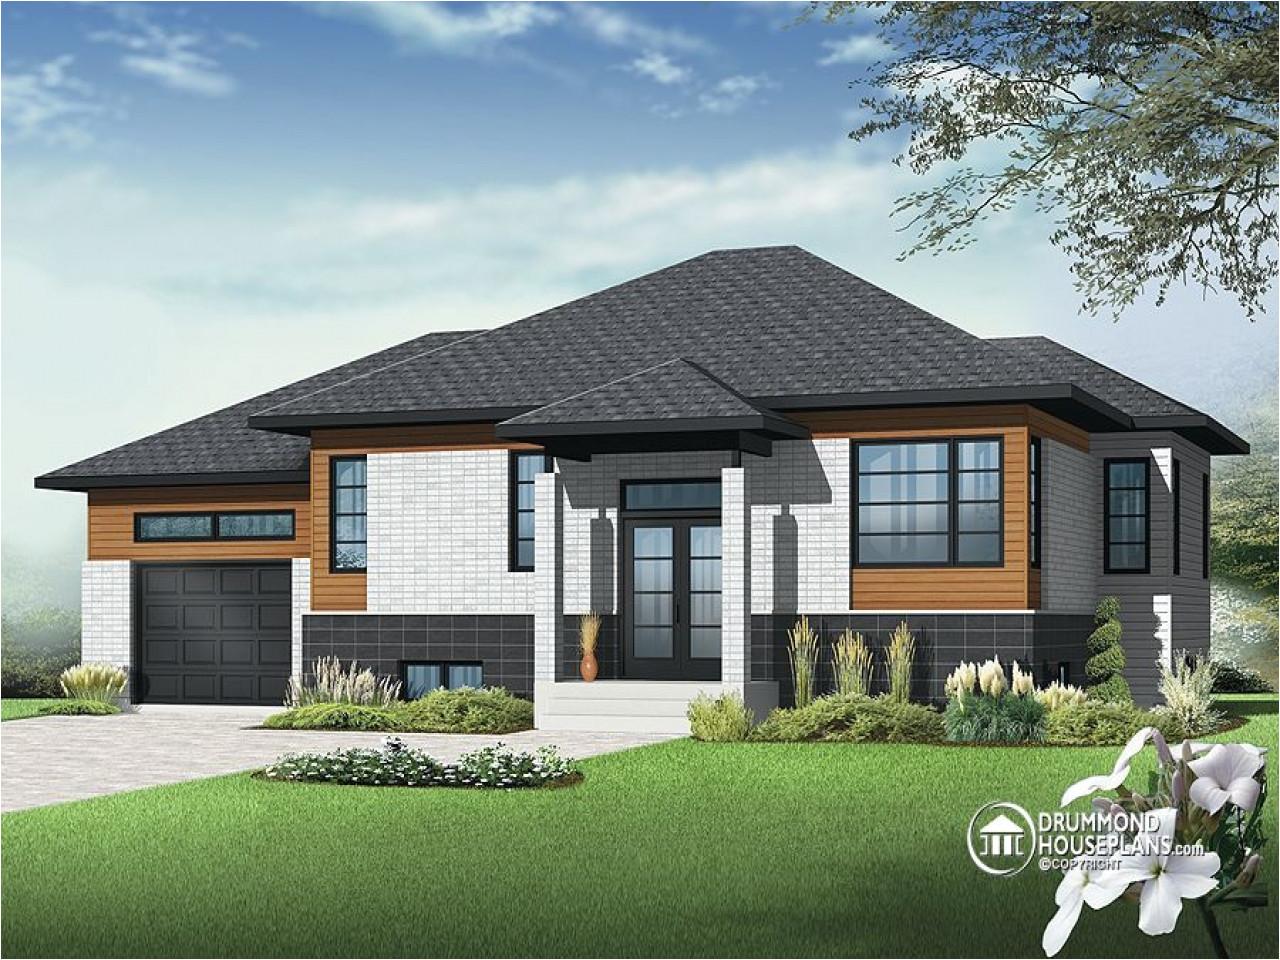 6fcf35a578008eb6 contemporary bungalow house plans one story bungalow floor plans